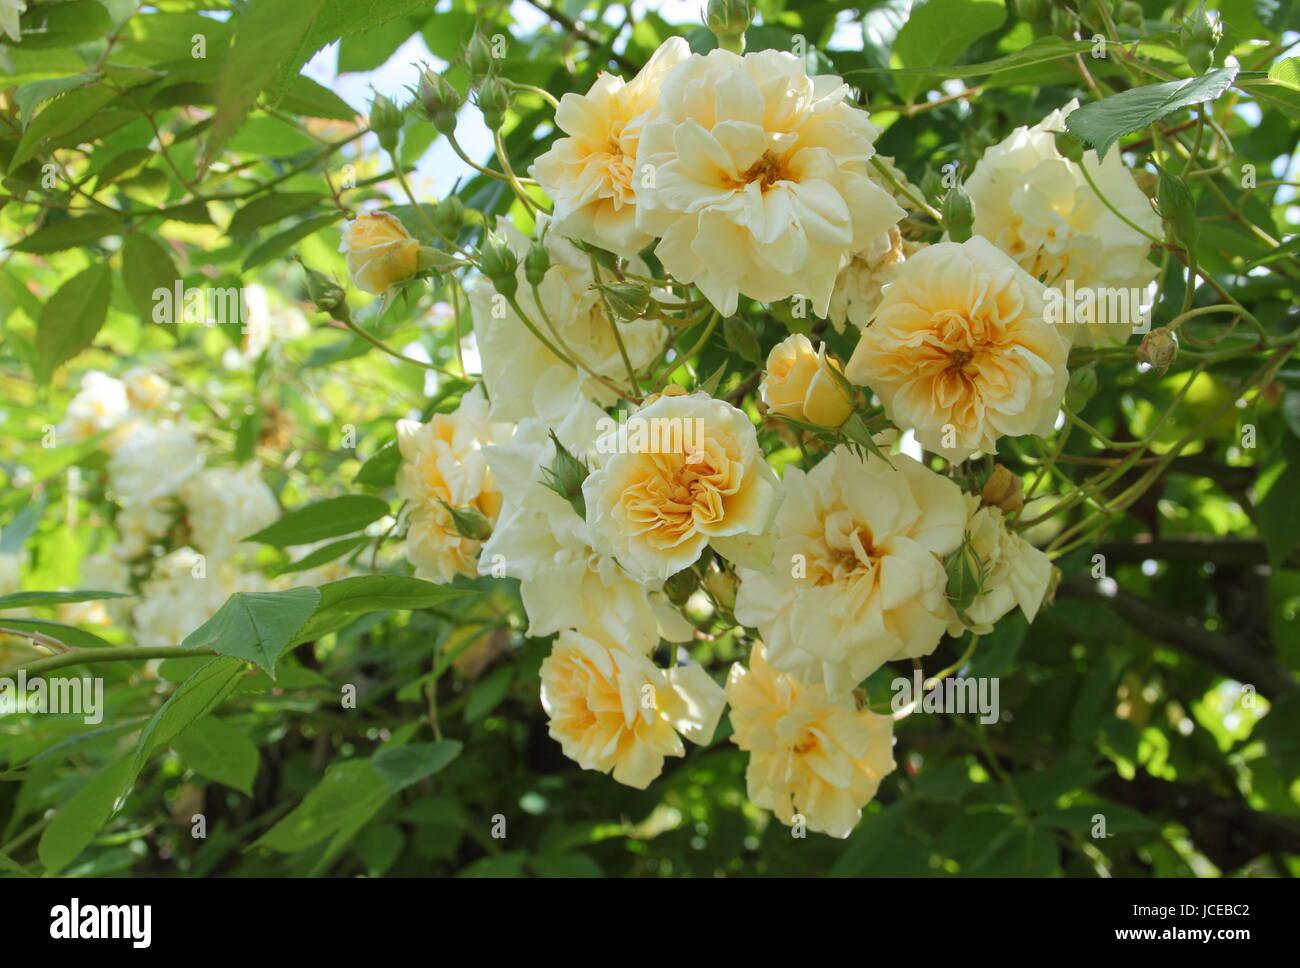 Rosa 'Alister Stella Gray', ('Golden Rambler') a repeat flowering, fragrant noisette rose, climbing - Stock Image